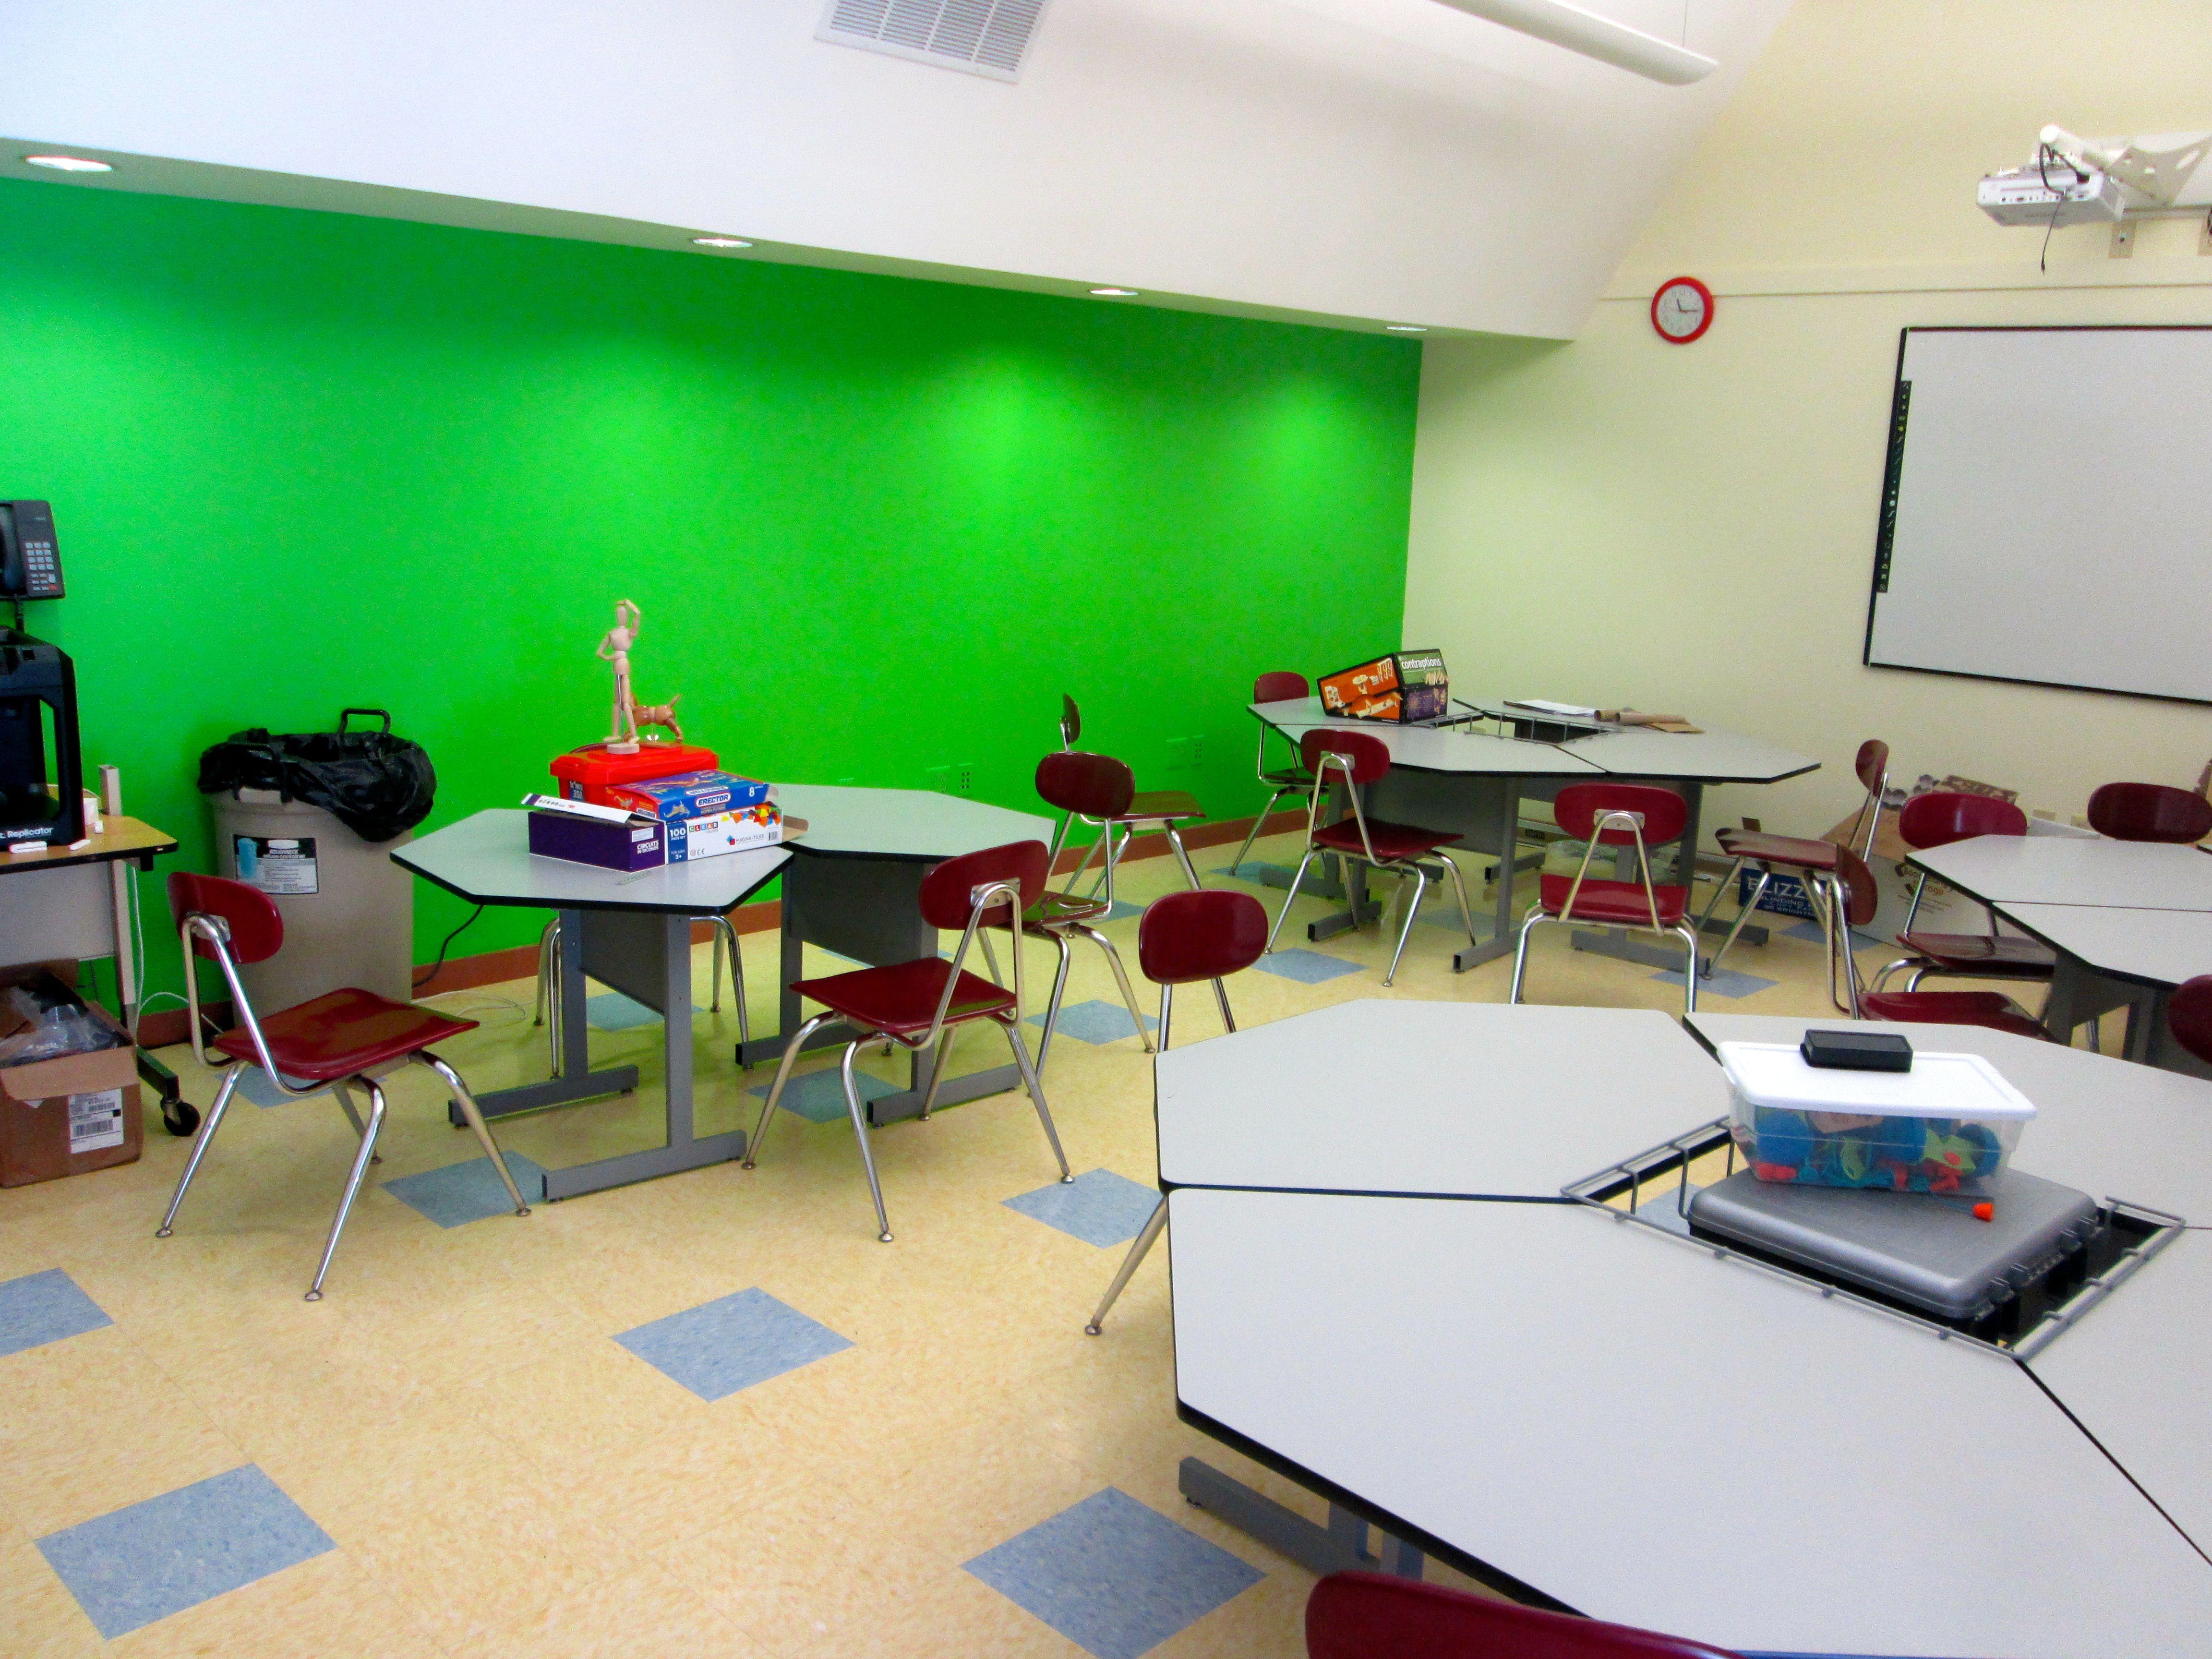 Makerspace Elementary School - Google Search